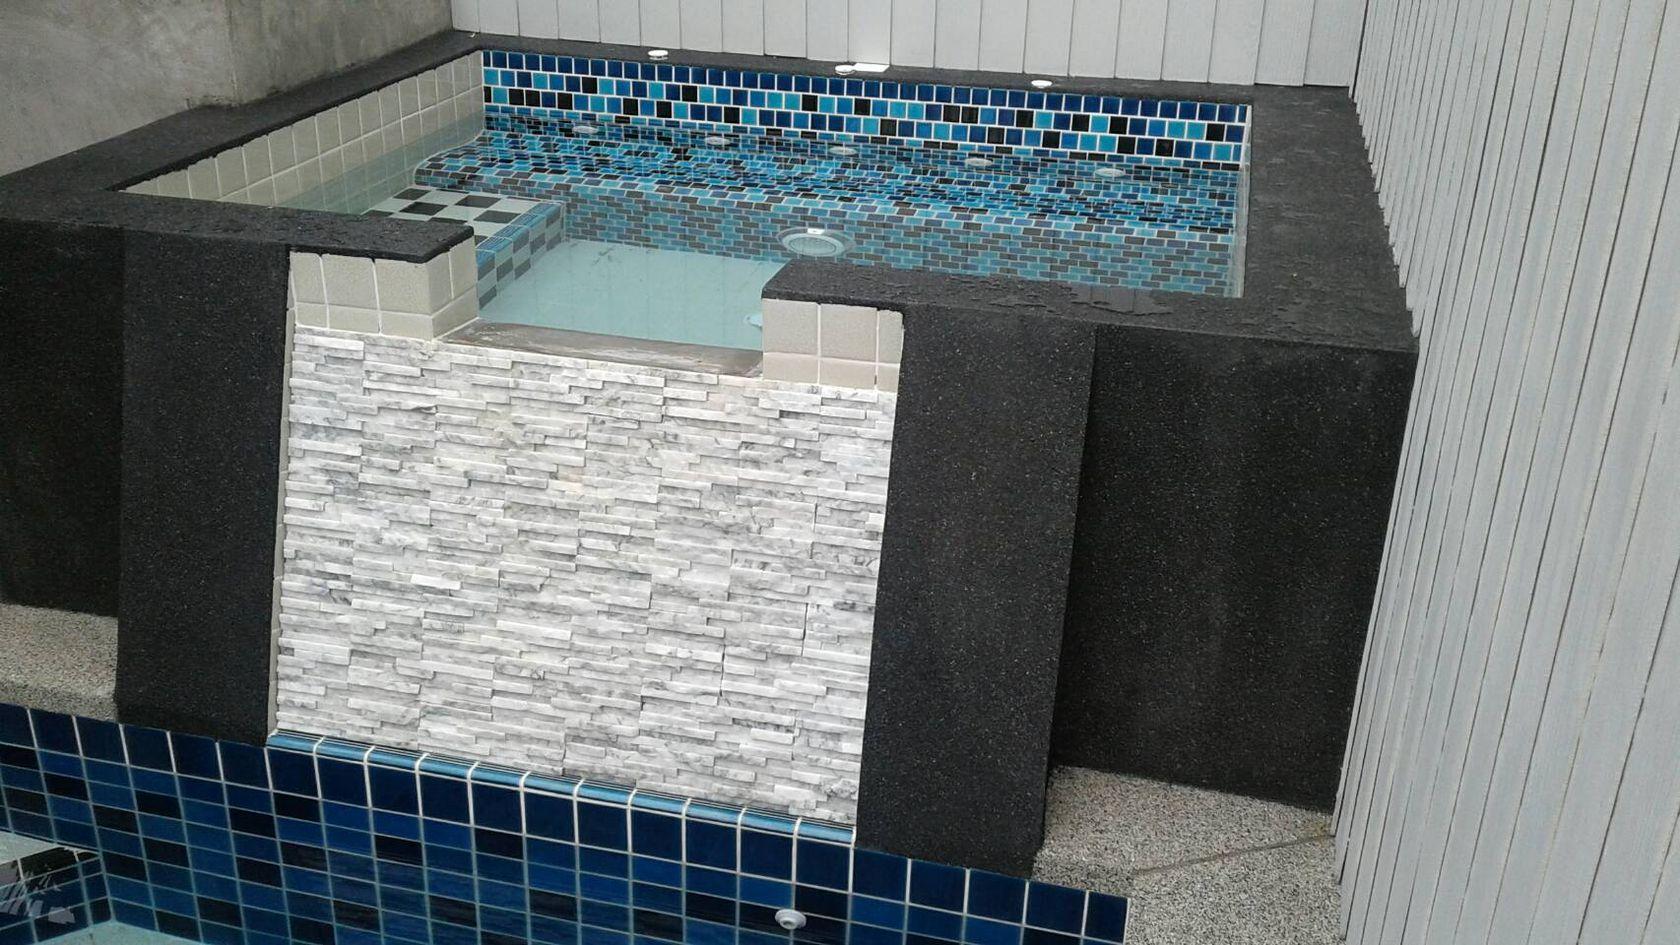 Grand Condotel Villa Rose with Private Pool แกรนด์ คอนโดเทล วิลลา โรส วิธ ไพรเวต พูล